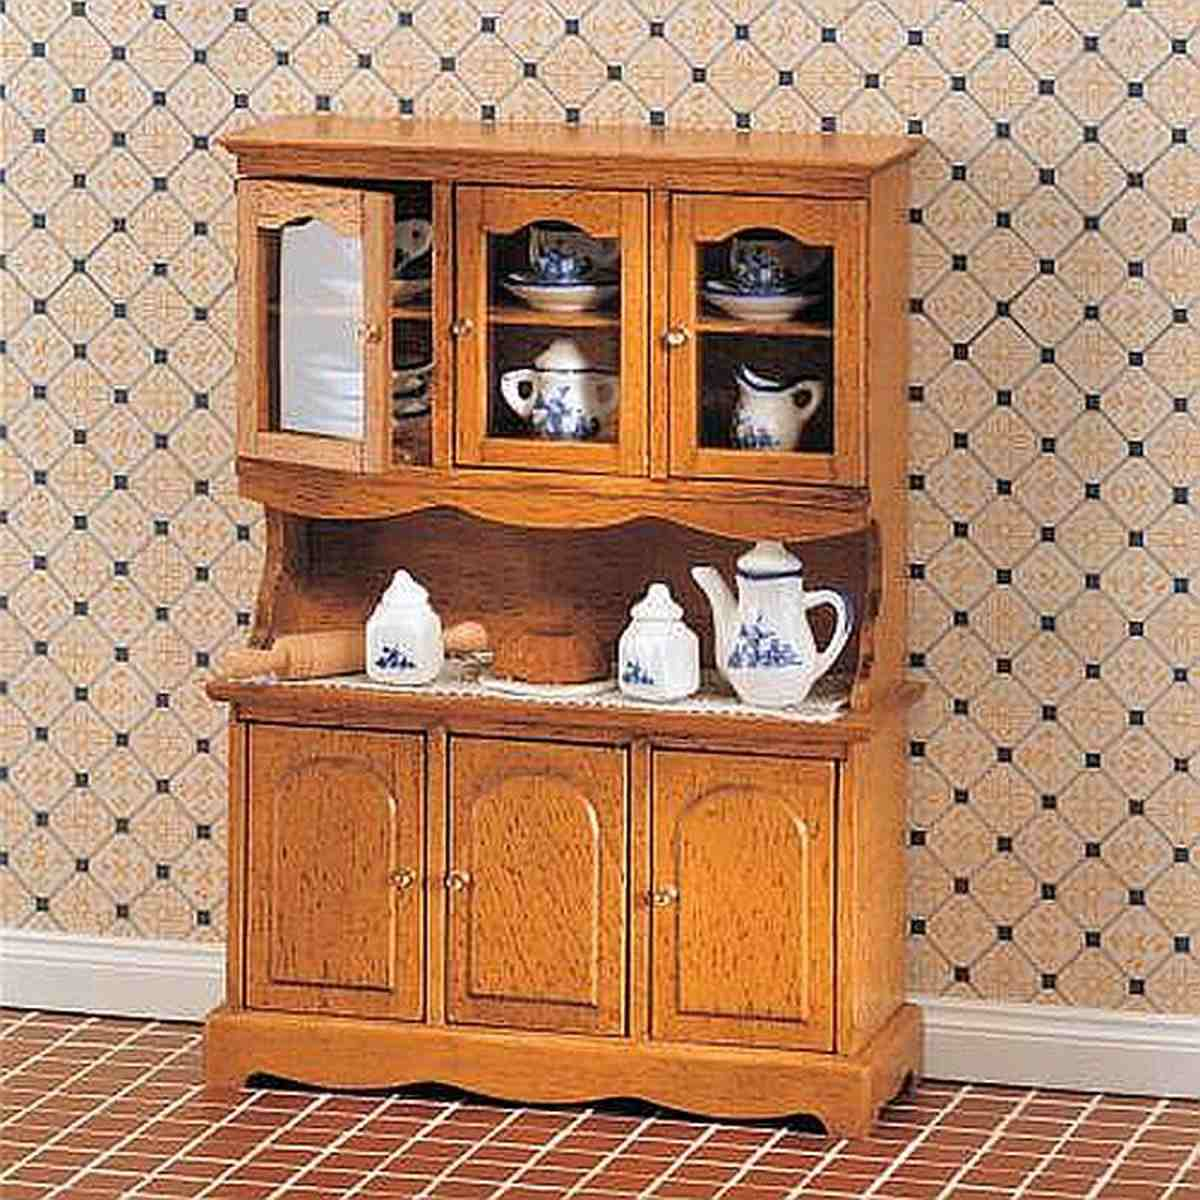 Large kitchen cupboard